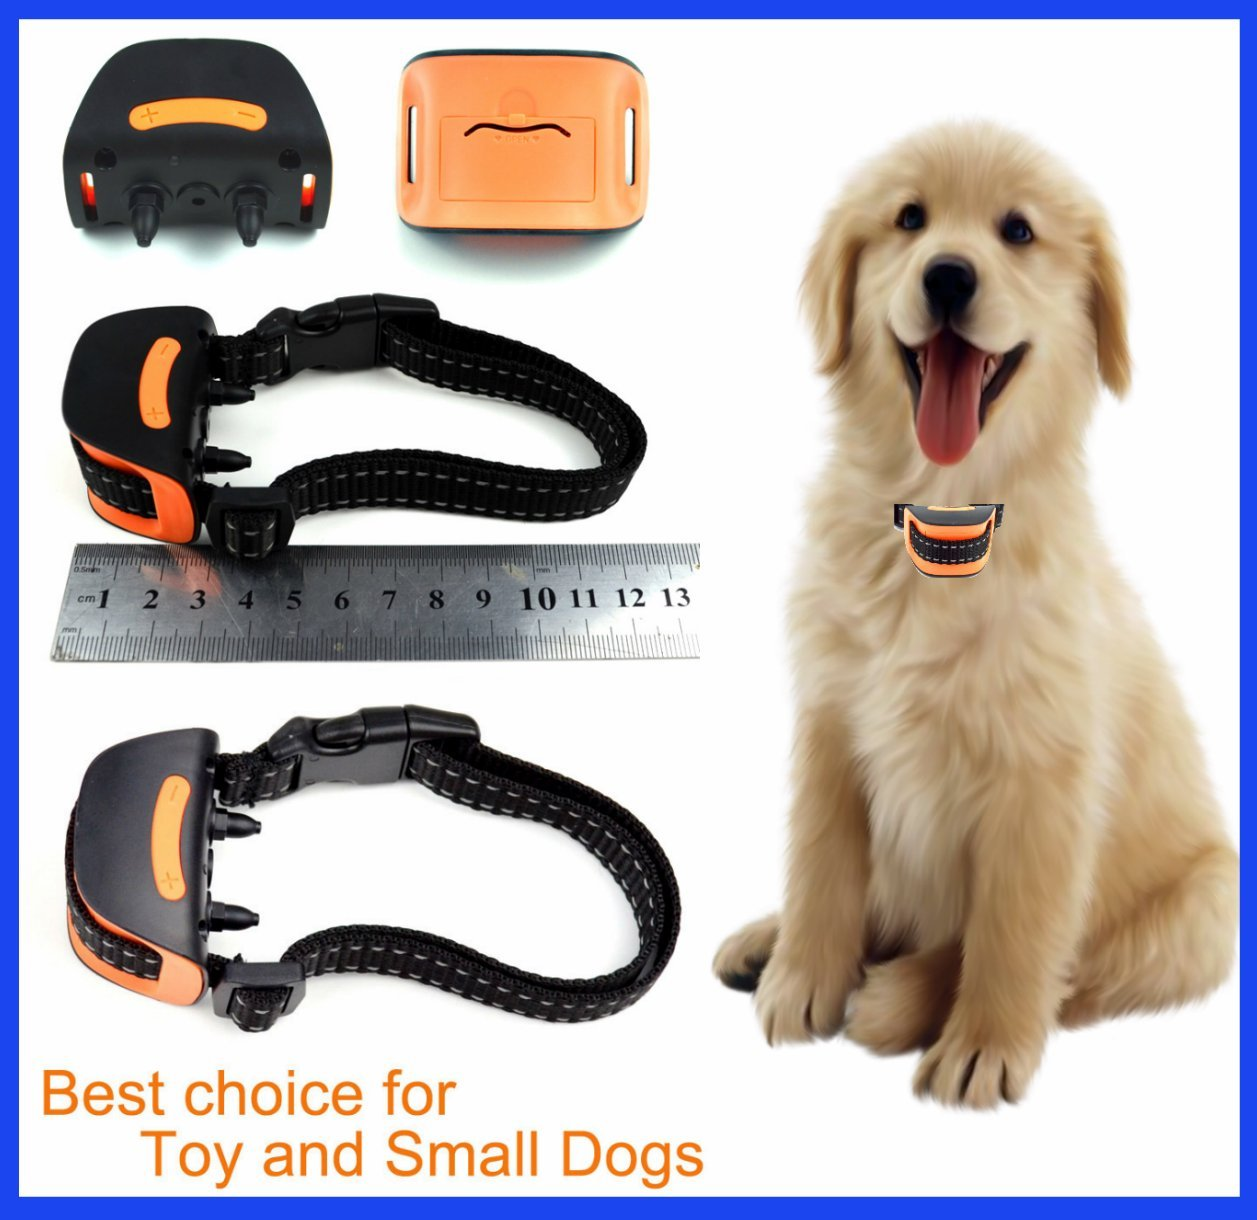 Classic MiniV (VIBRATION) No Bark Dog Collar ( Extra Small Toy Dogs 4lbs to 1